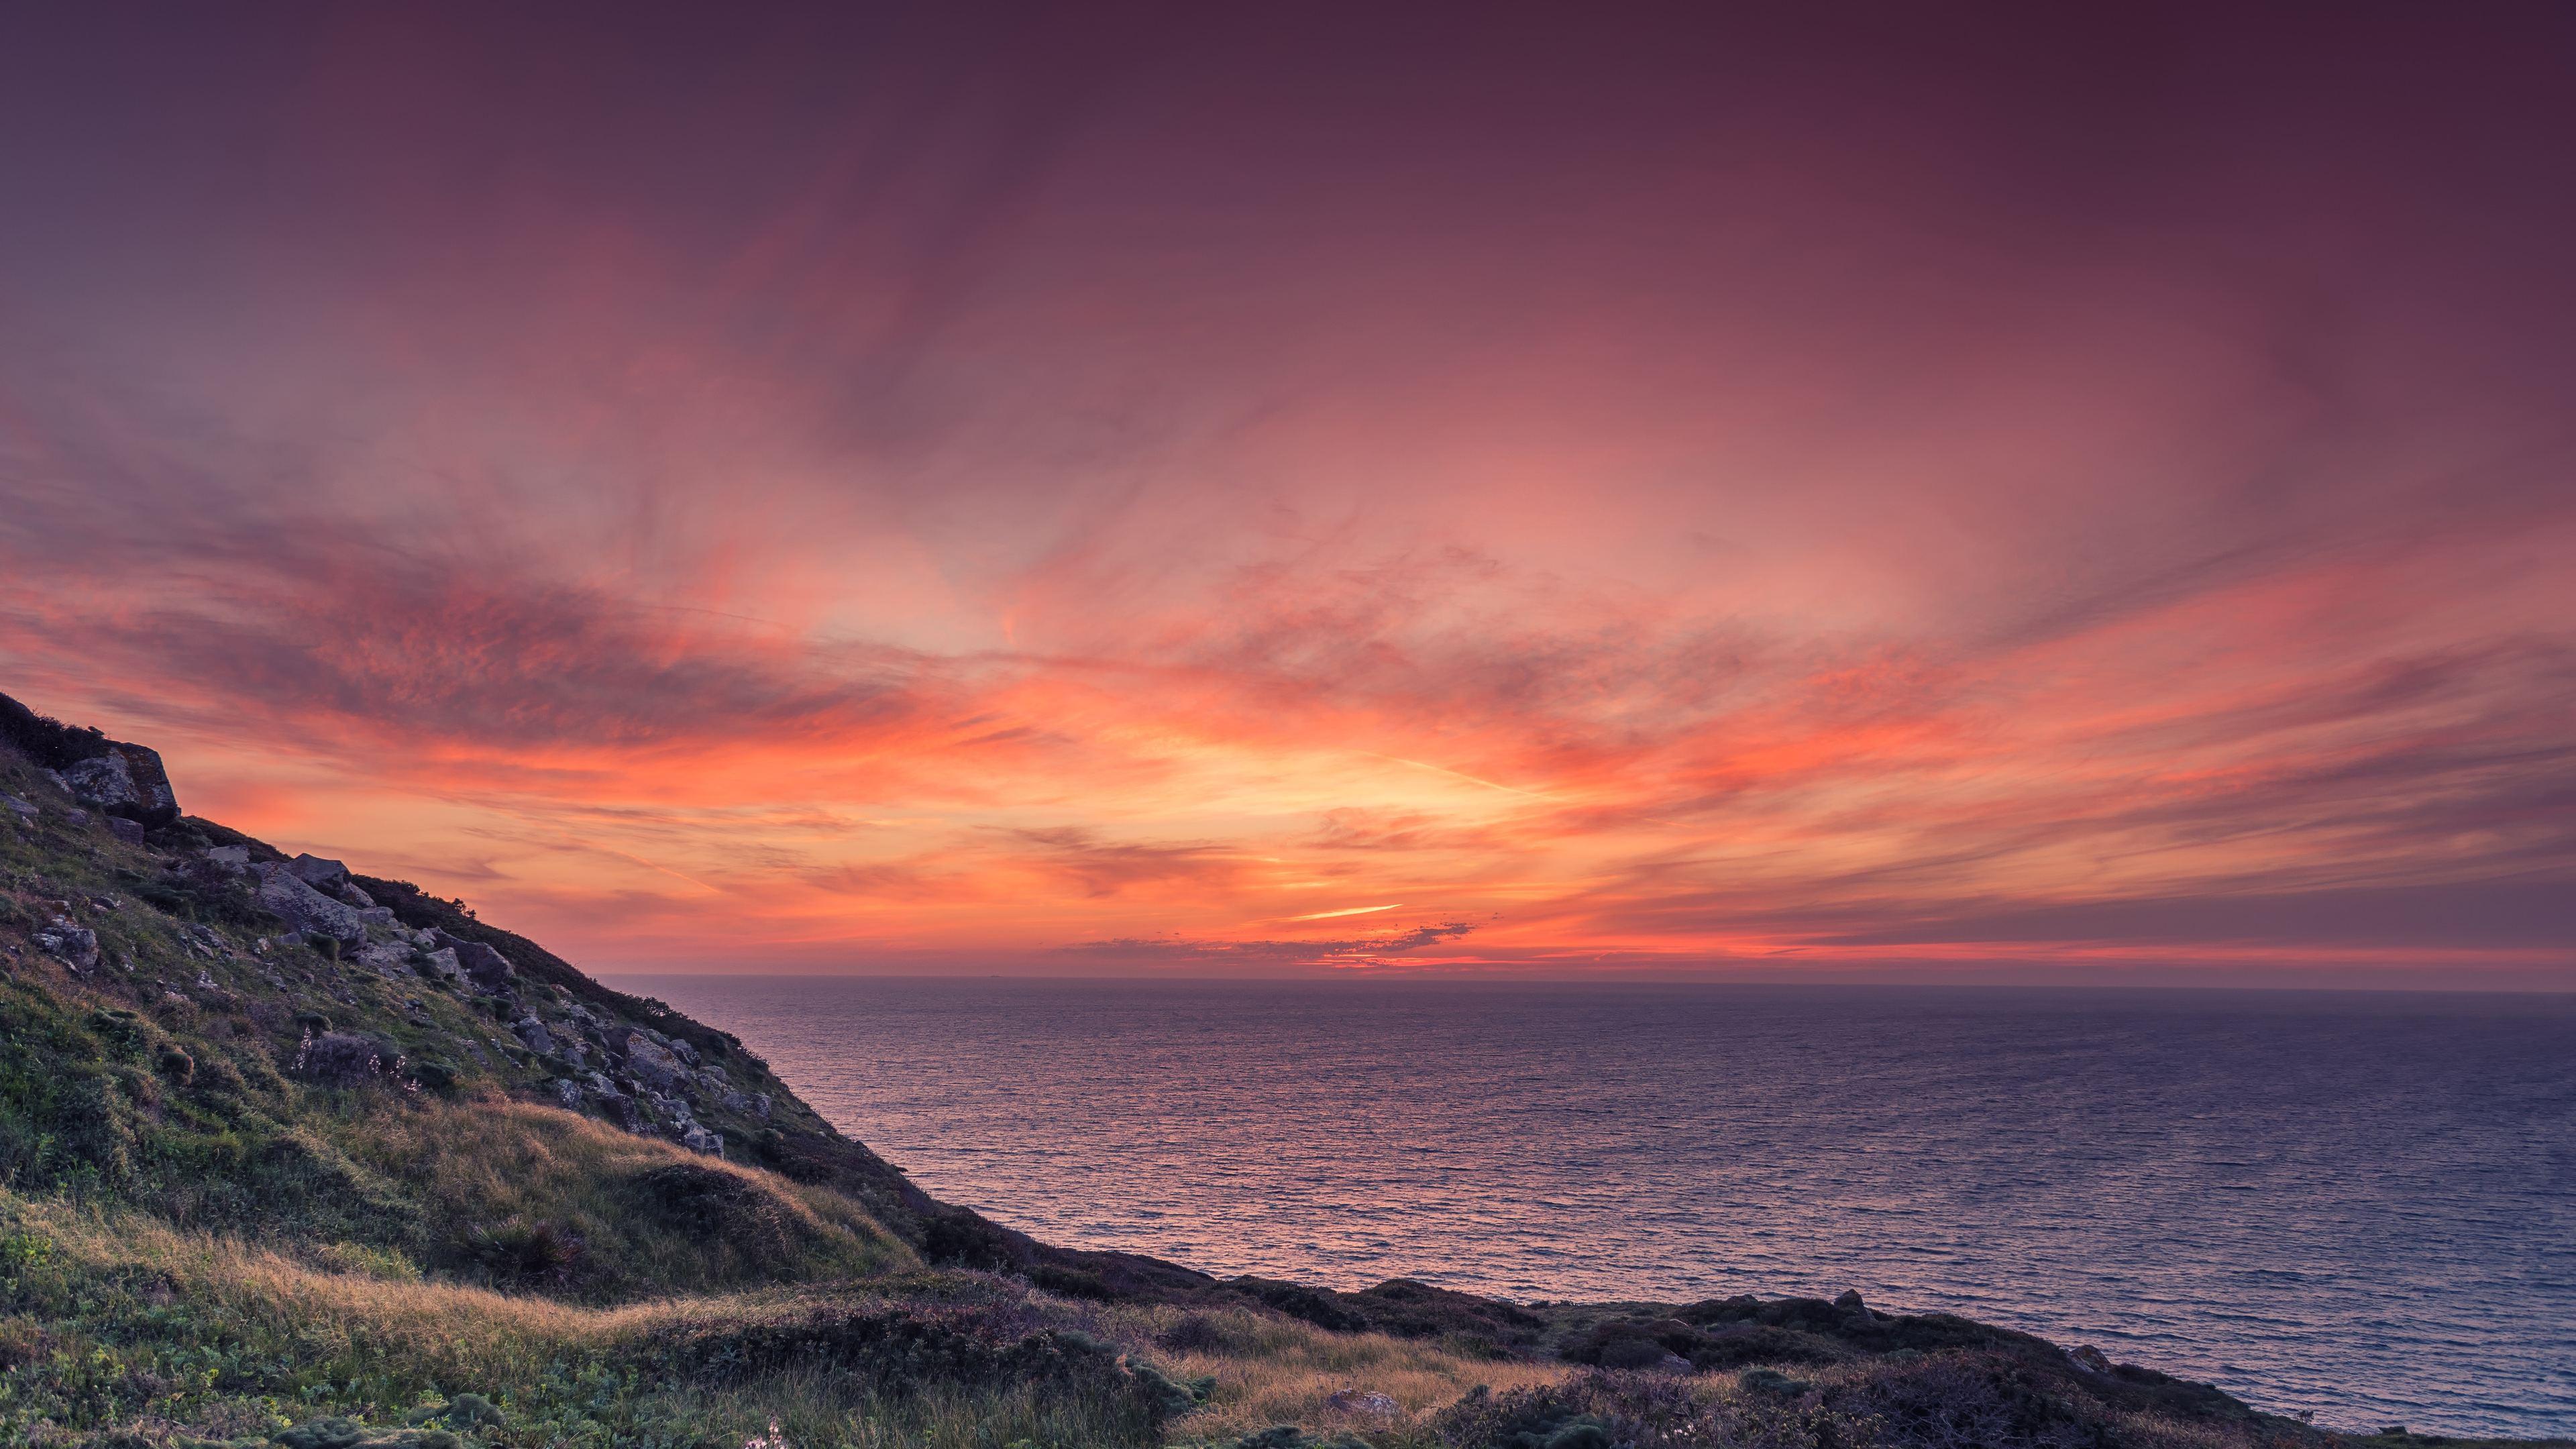 orange sky sunset at beach 1540143165 - Orange Sky Sunset At Beach - sunset wallpapers, sky wallpapers, nature wallpapers, hd-wallpapers, beach wallpapers, 5k wallpapers, 4k-wallpapers